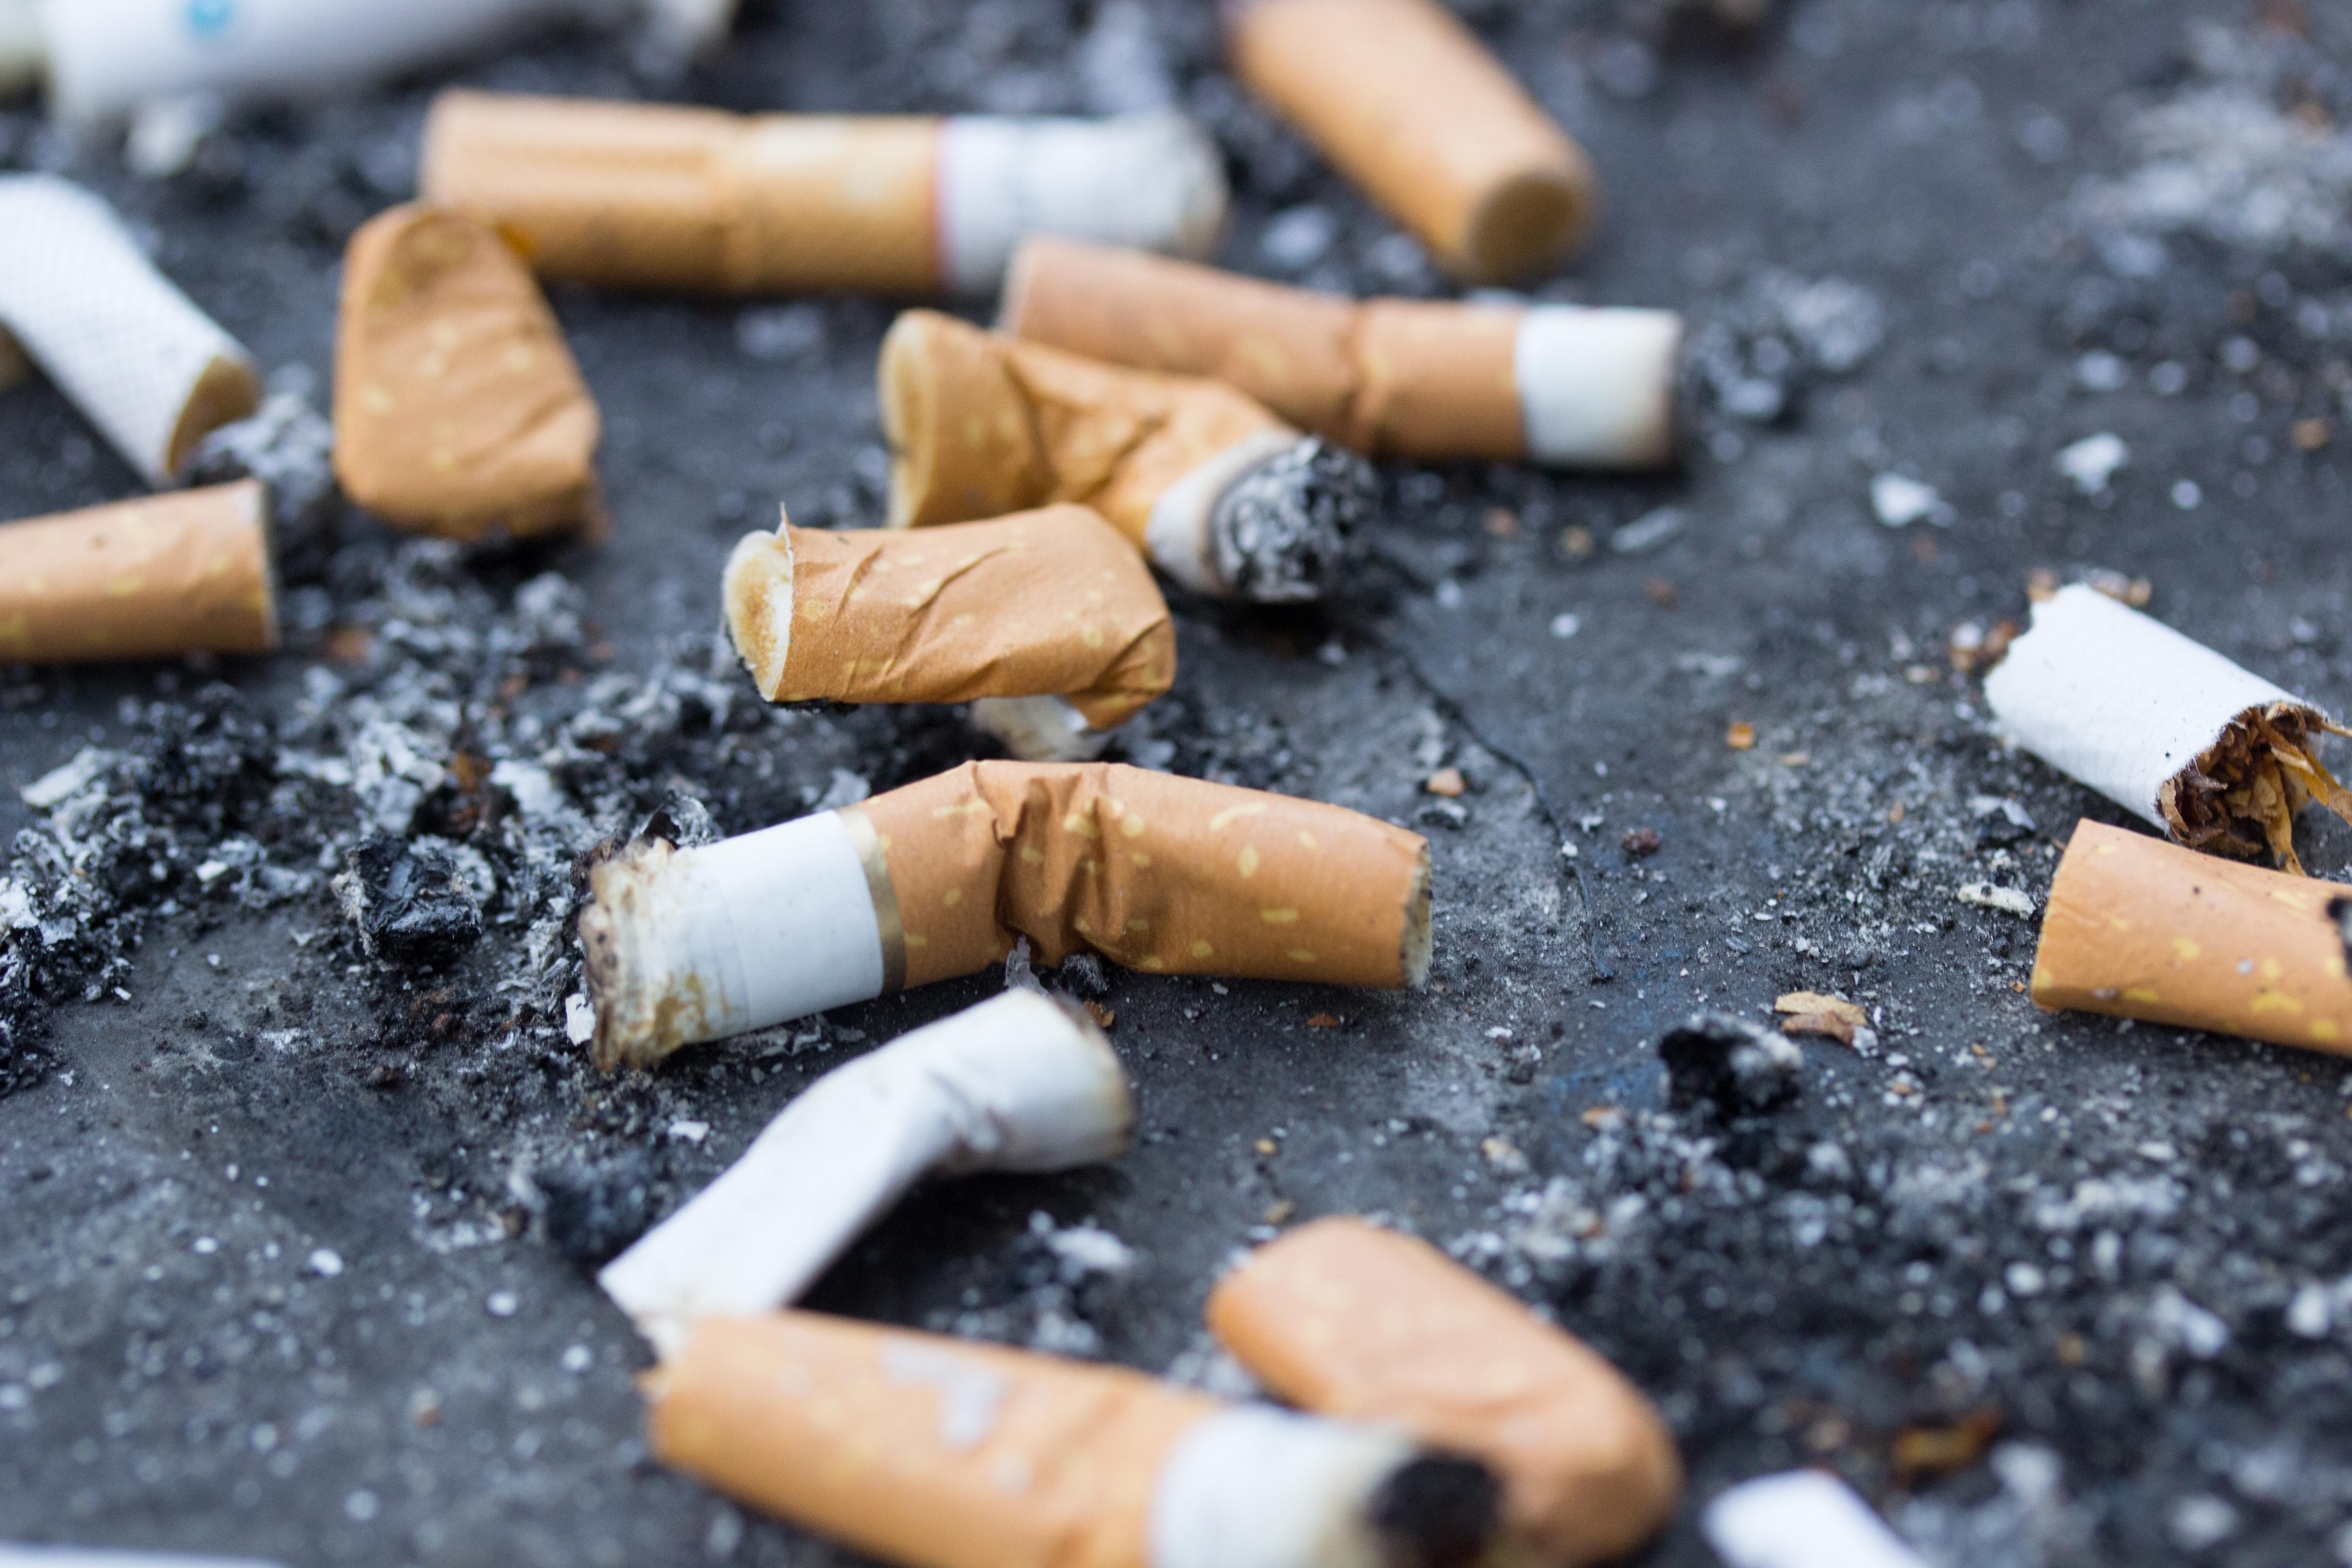 Close to schools lurk killer-stick suppliers